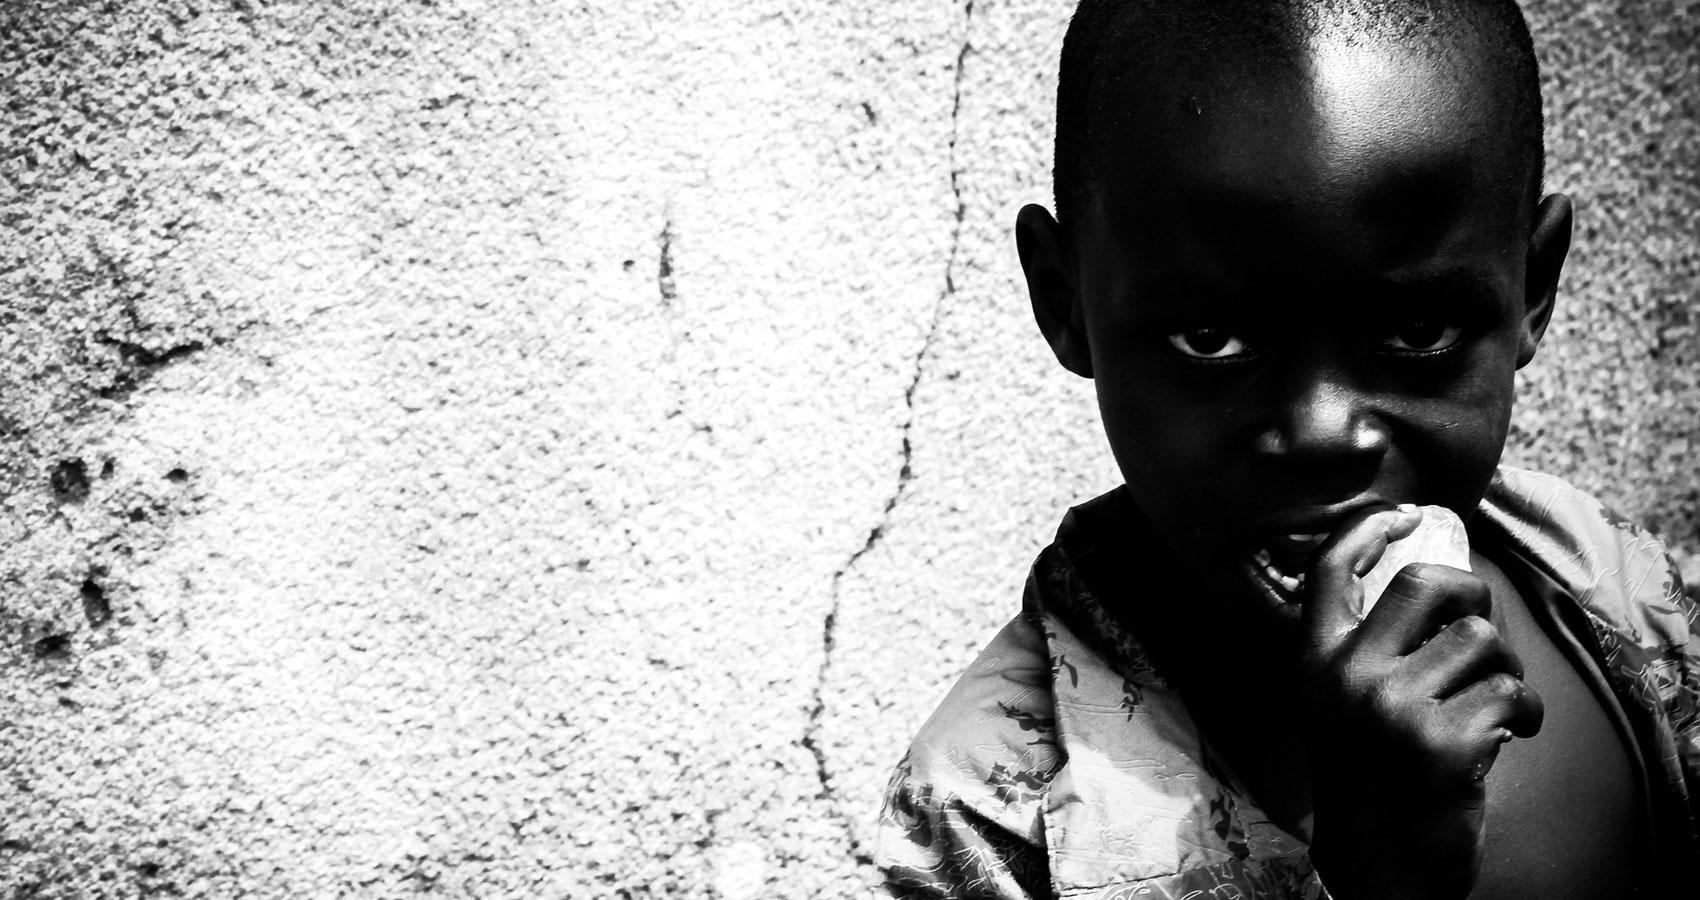 MURDERED BOYS by Chanda Chongoat Spillwords.com